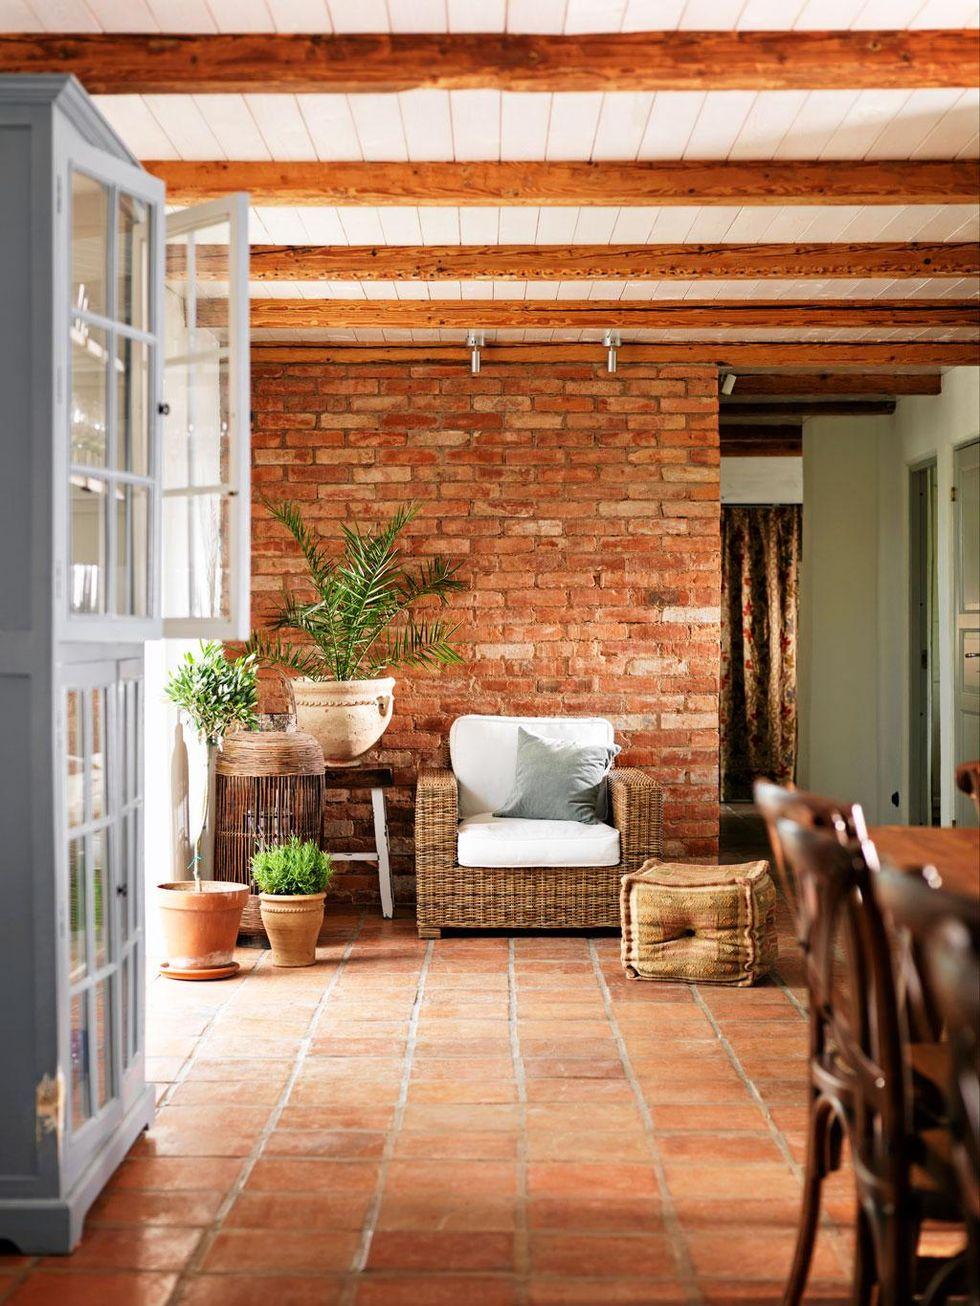 Image Credit: Villa Mammerhills